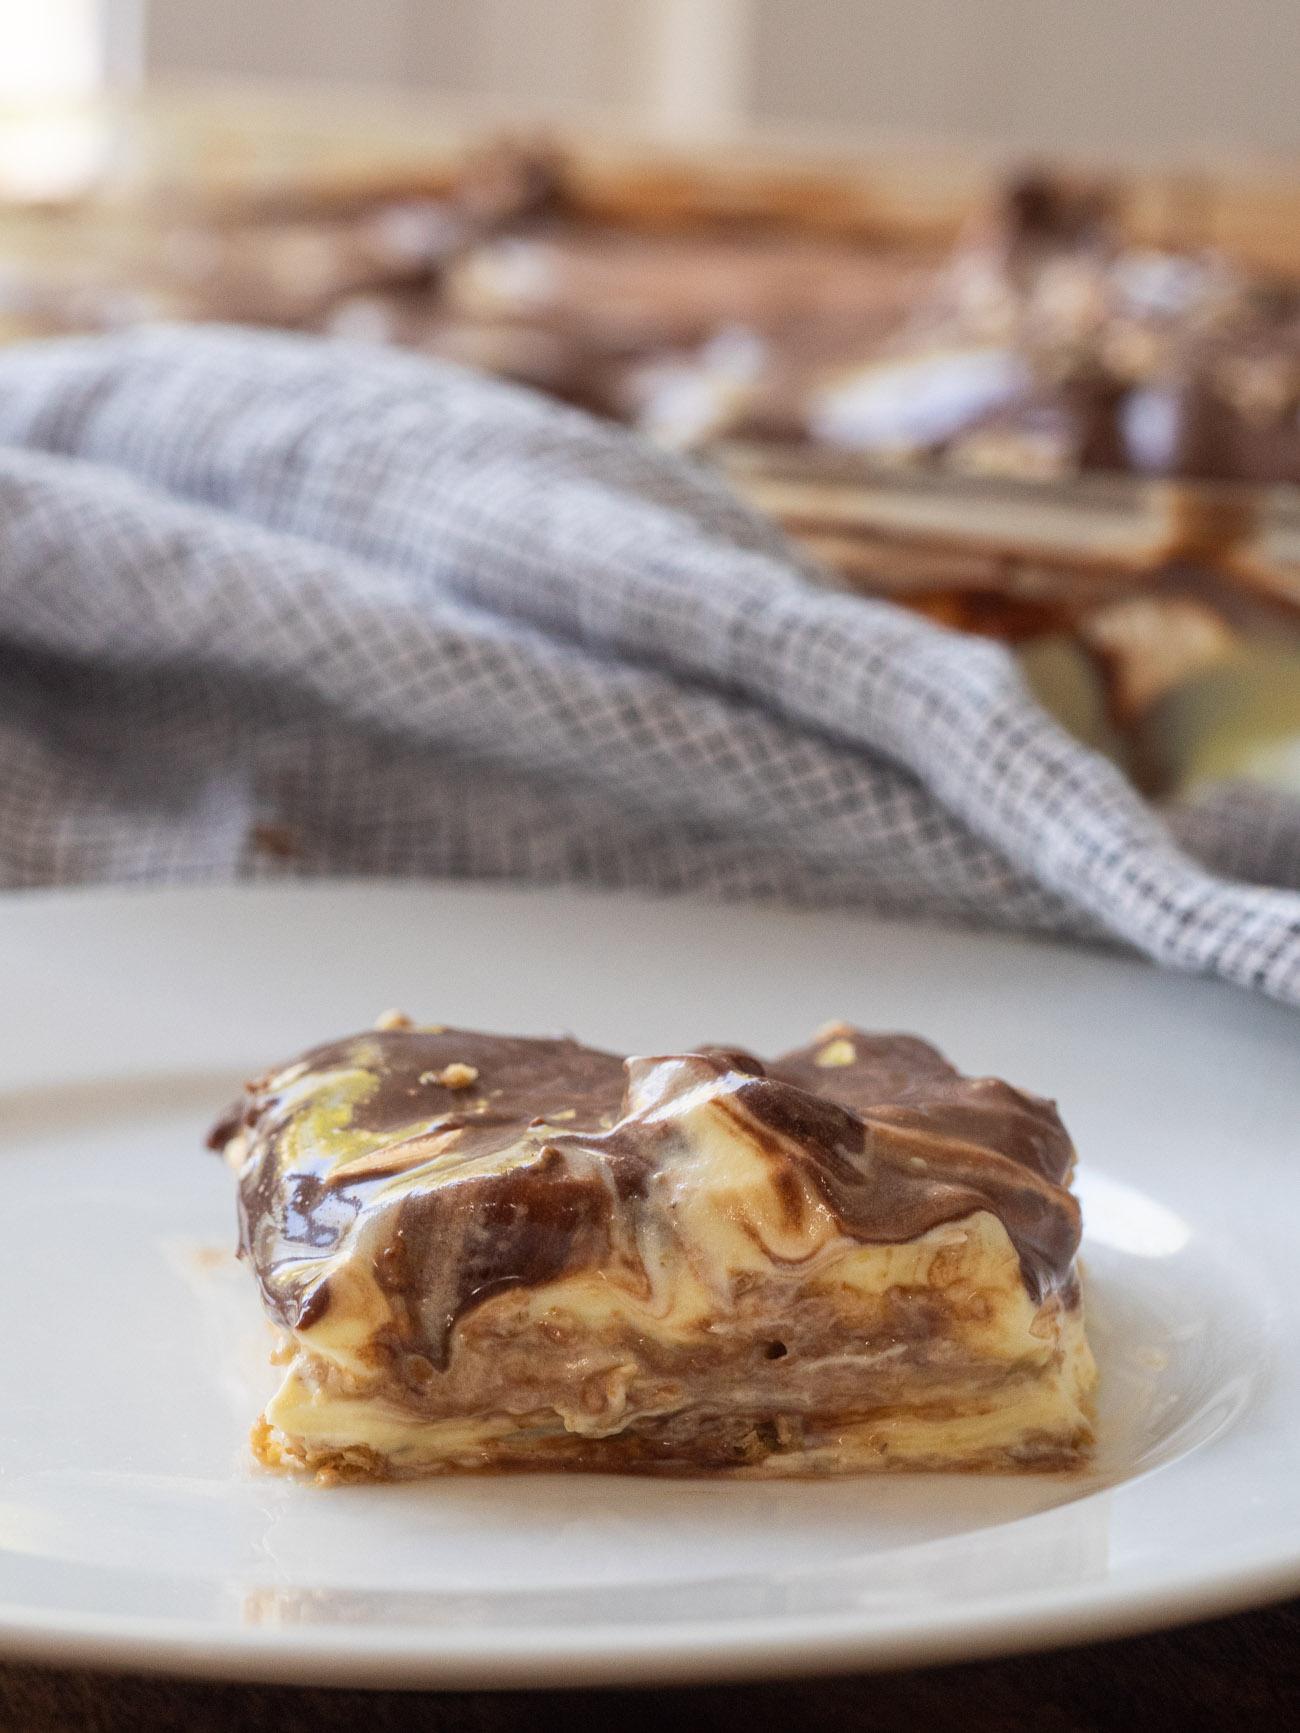 Chocolate Eclair Refrigerator Cake